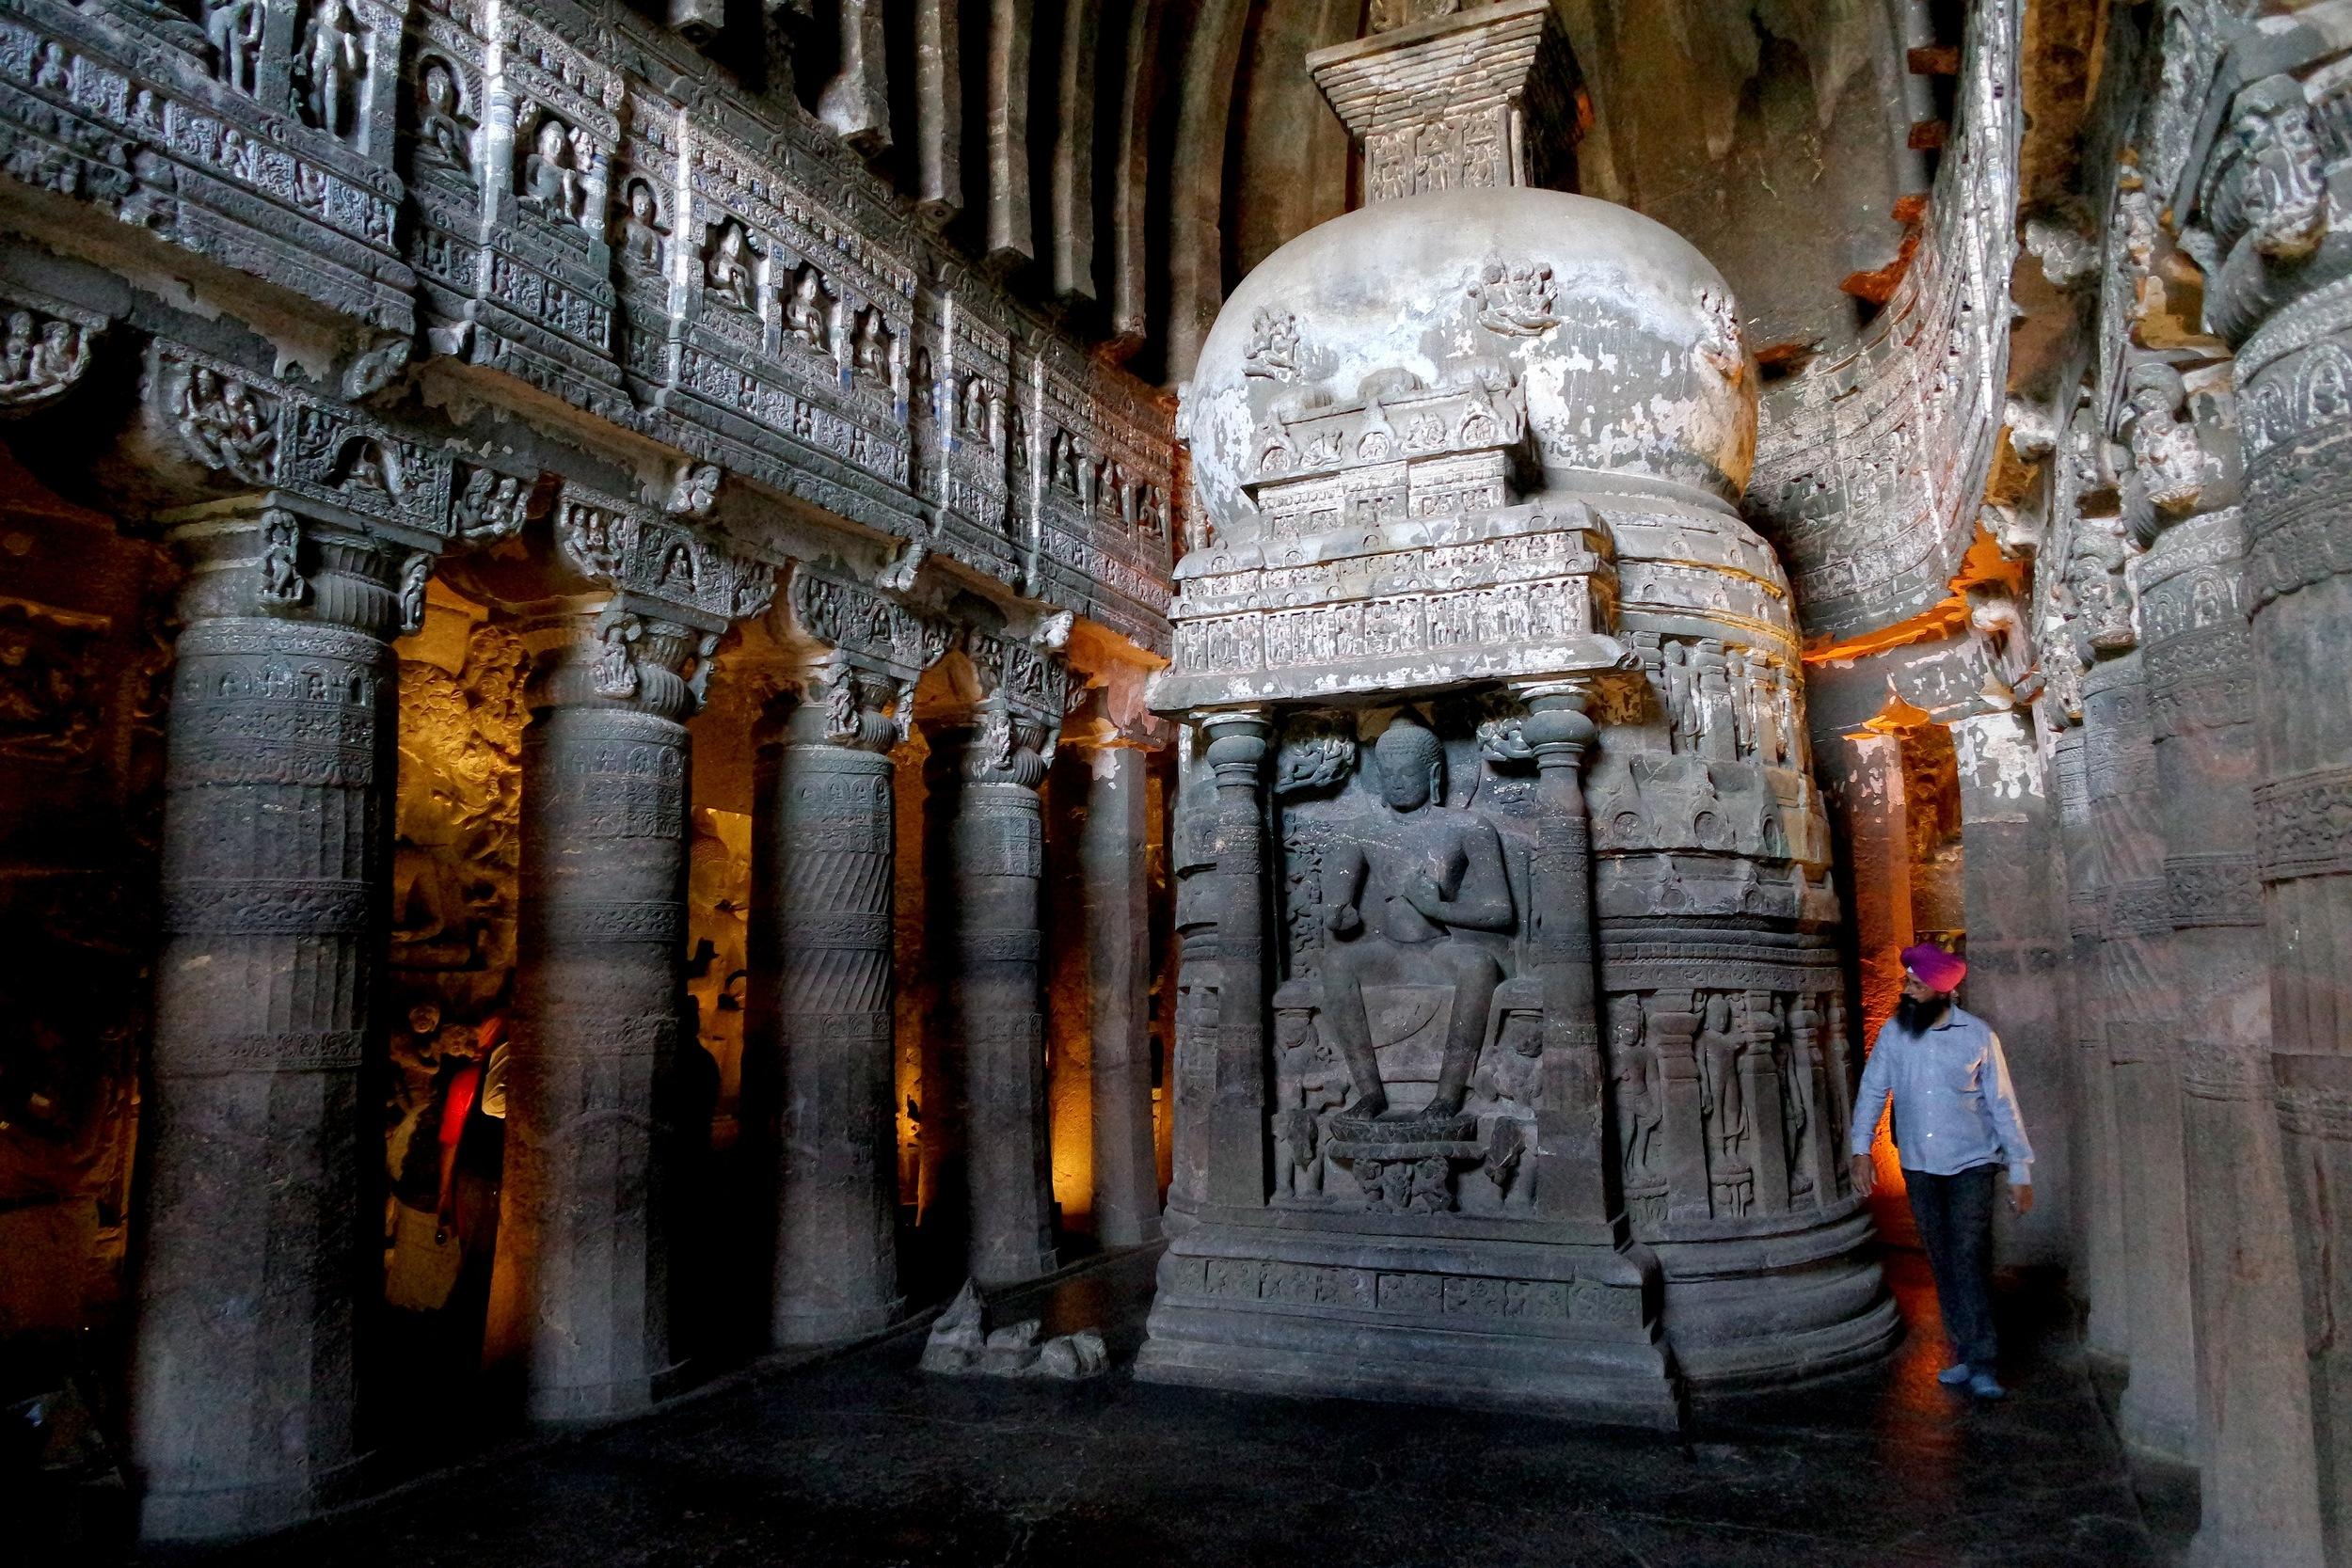 Cave 26: Devotees circumambulate, or walk around, the stupa